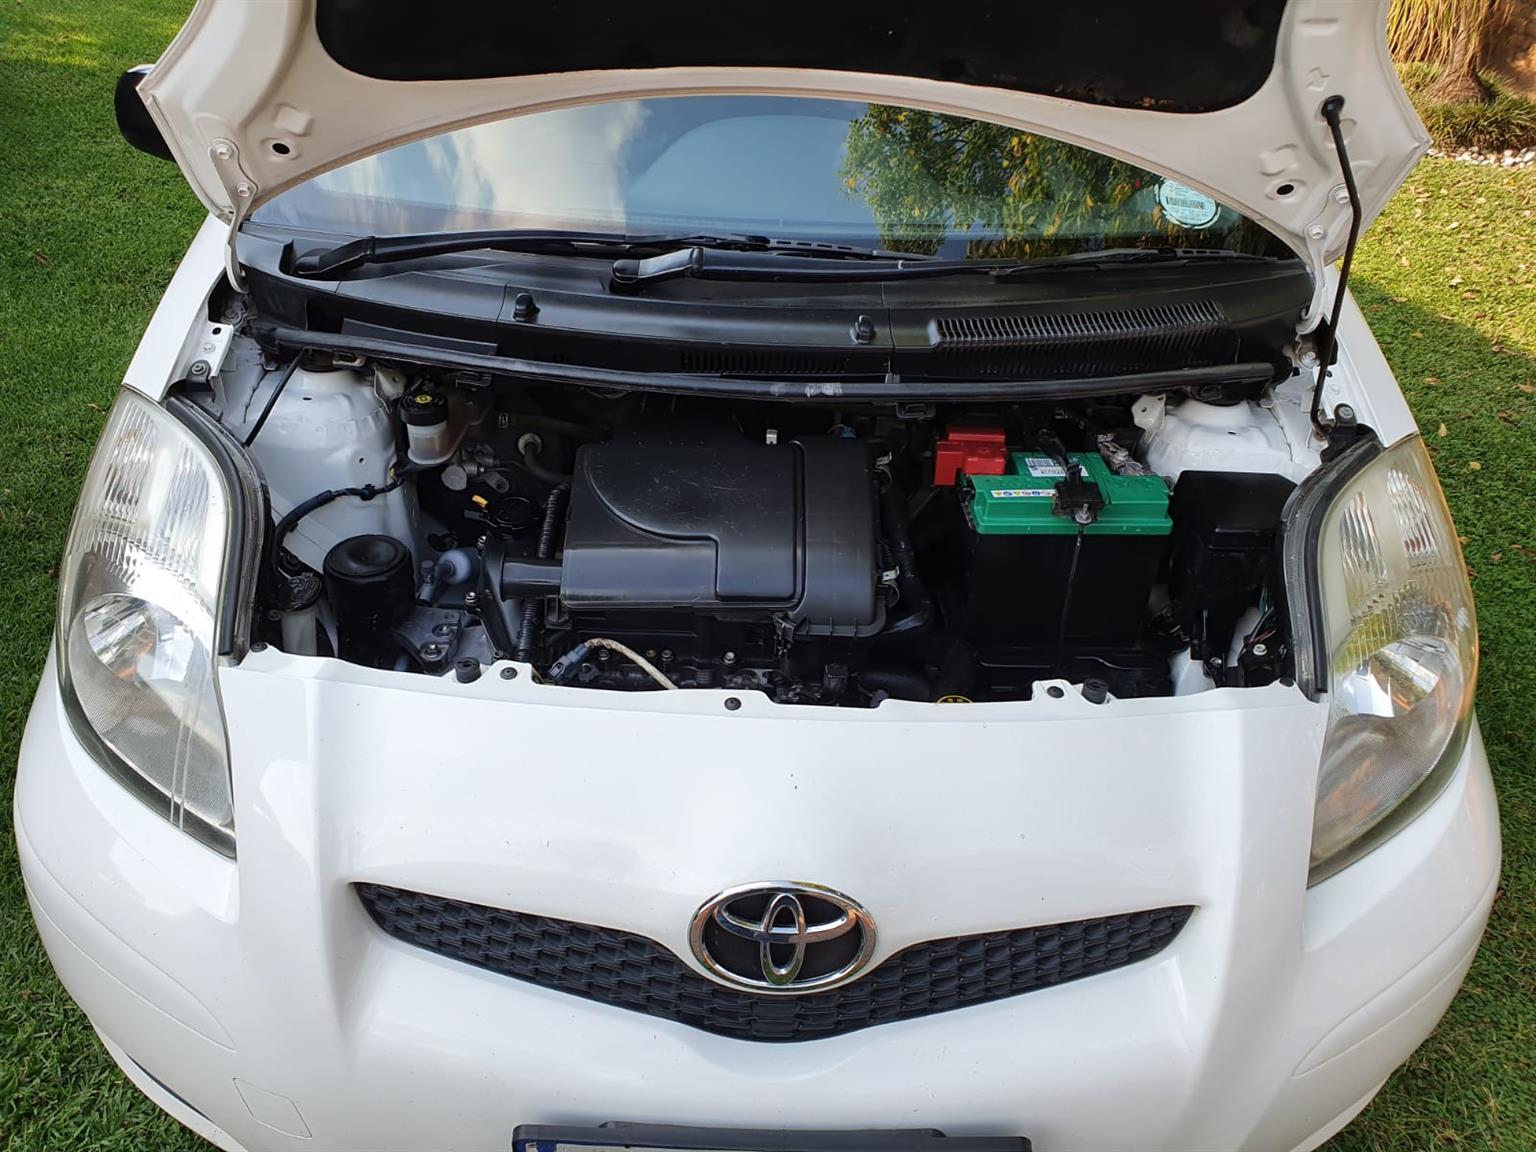 2009 Toyota Yaris 1.0